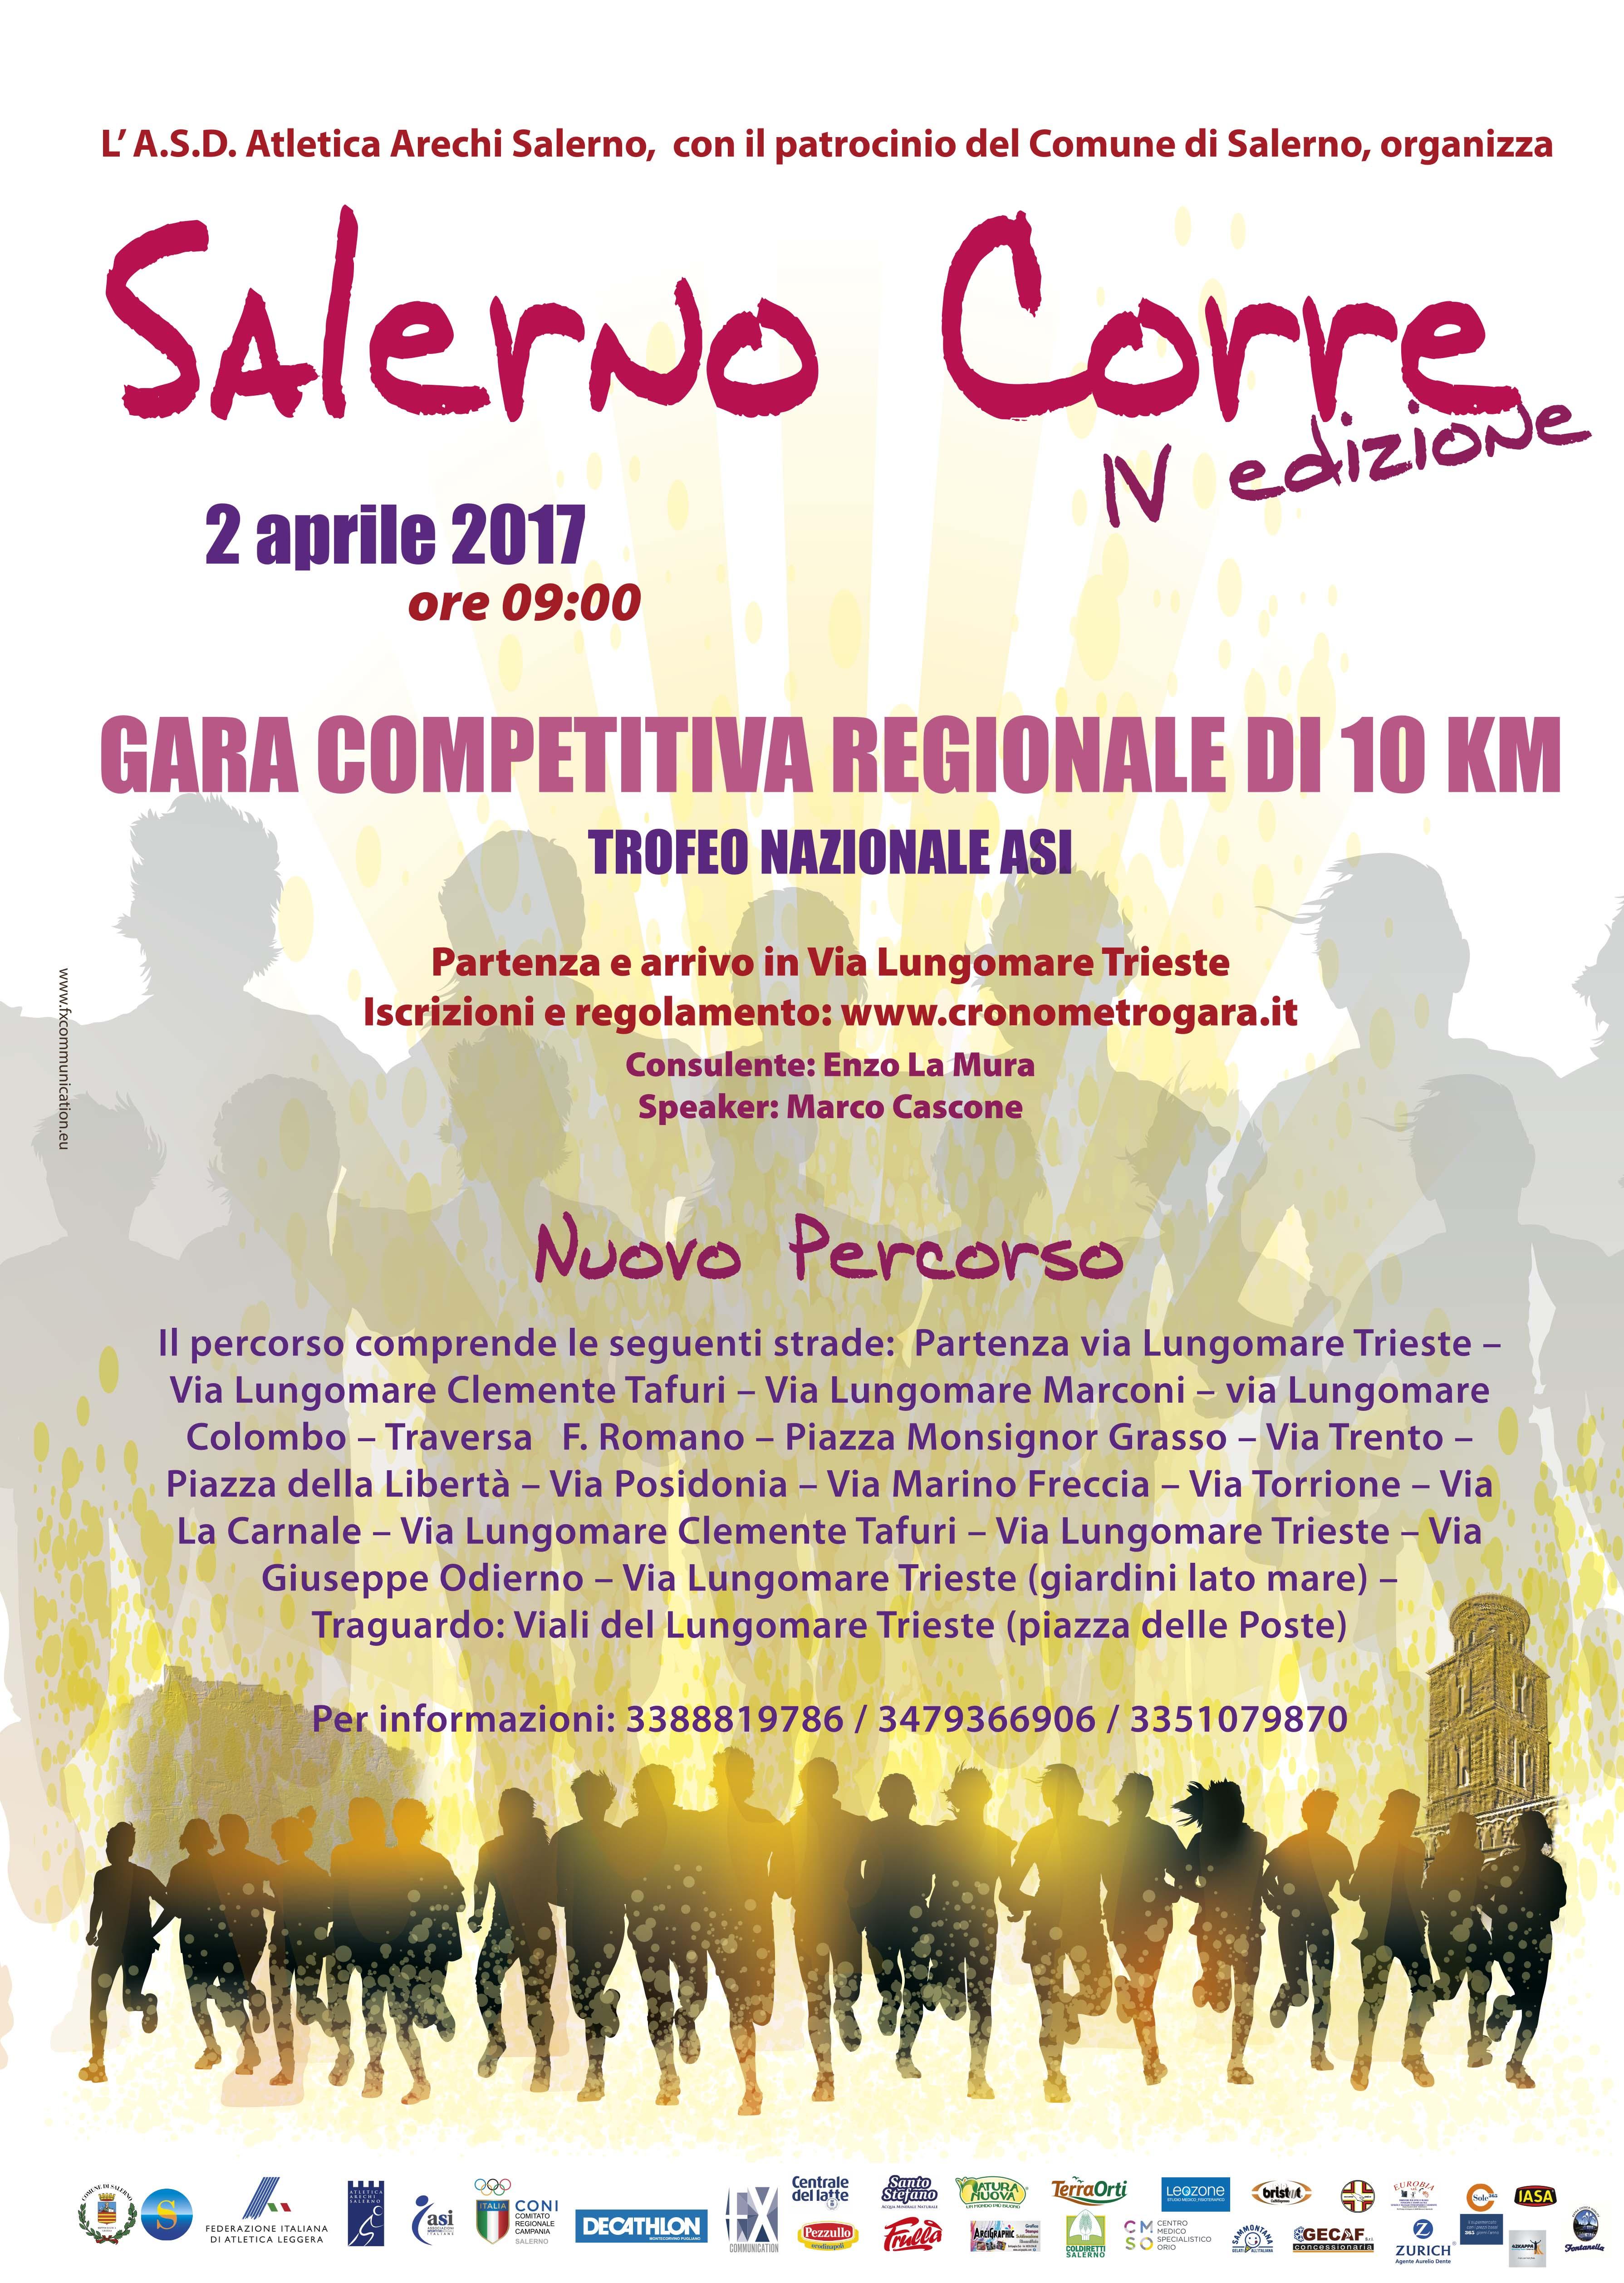 Salerno corre 2017